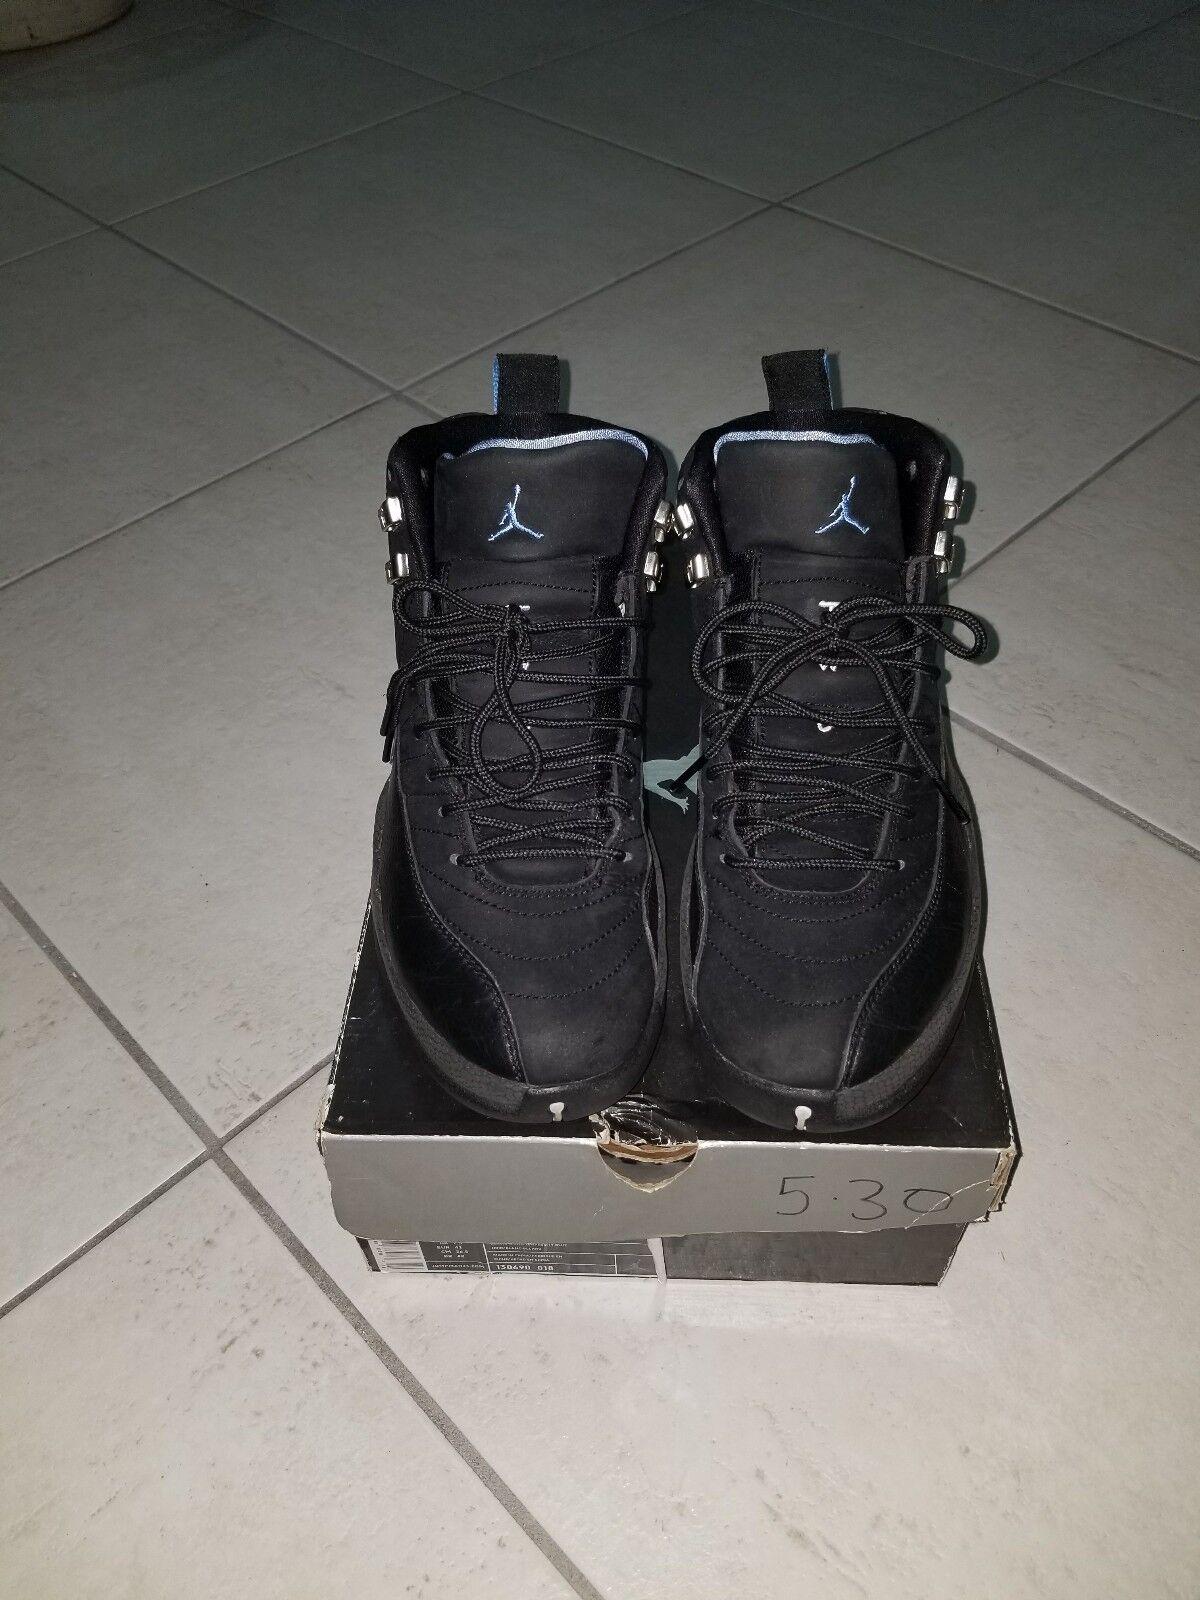 Air Jordan XII 12 Retro Black University bluee Sz 8.5